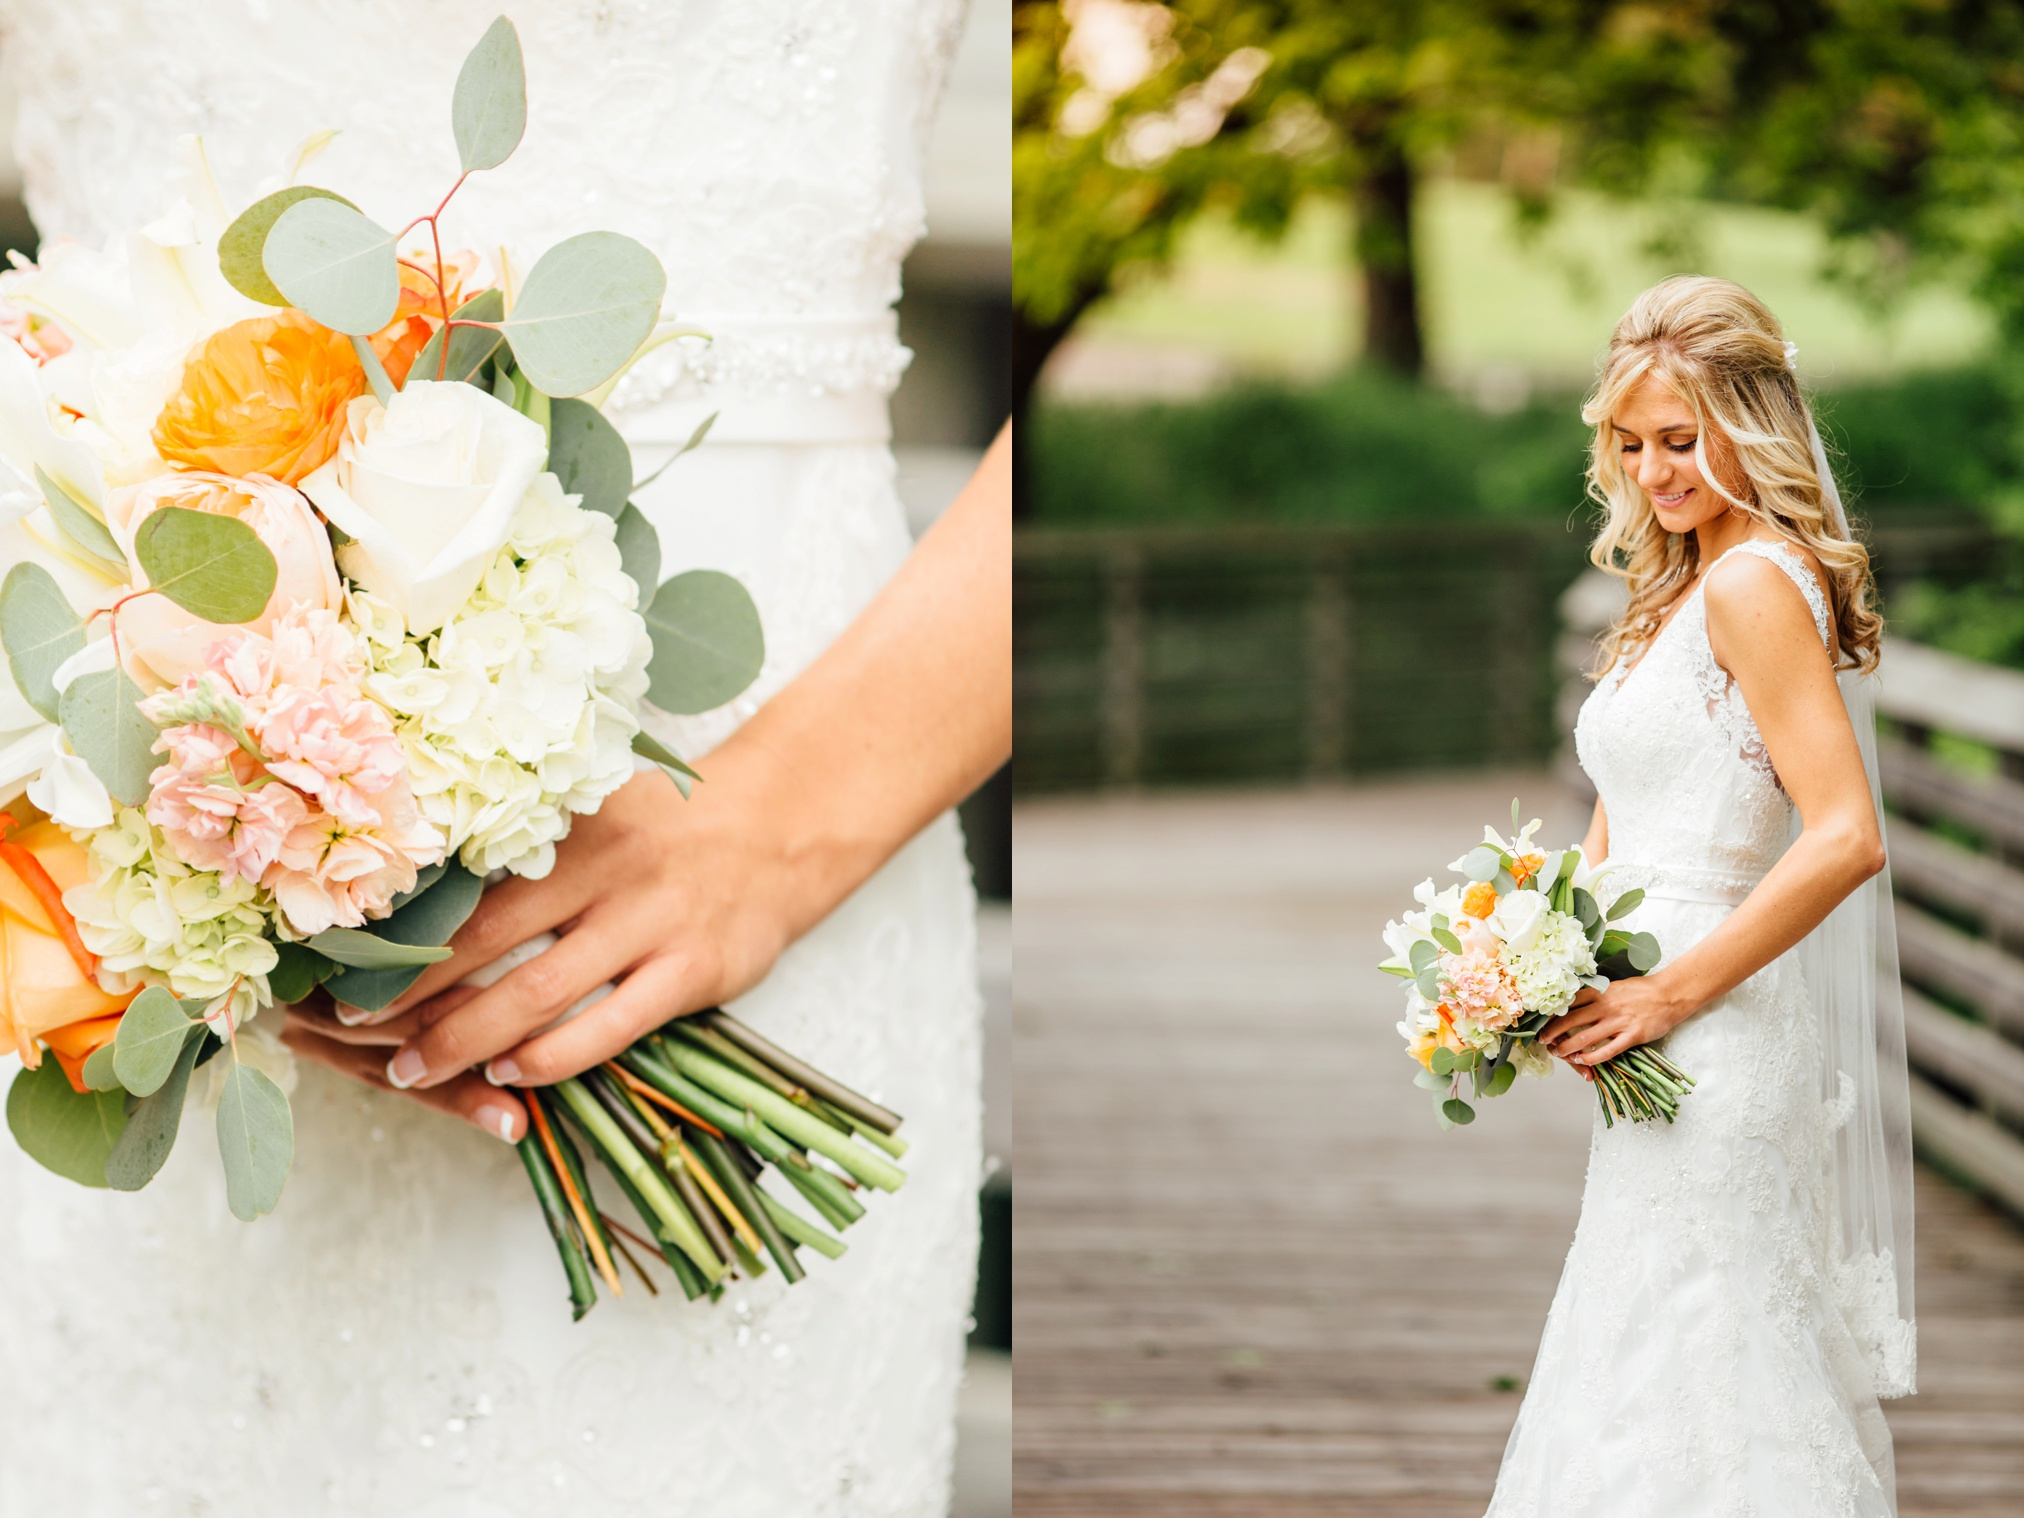 schmid_wedding-103.jpg